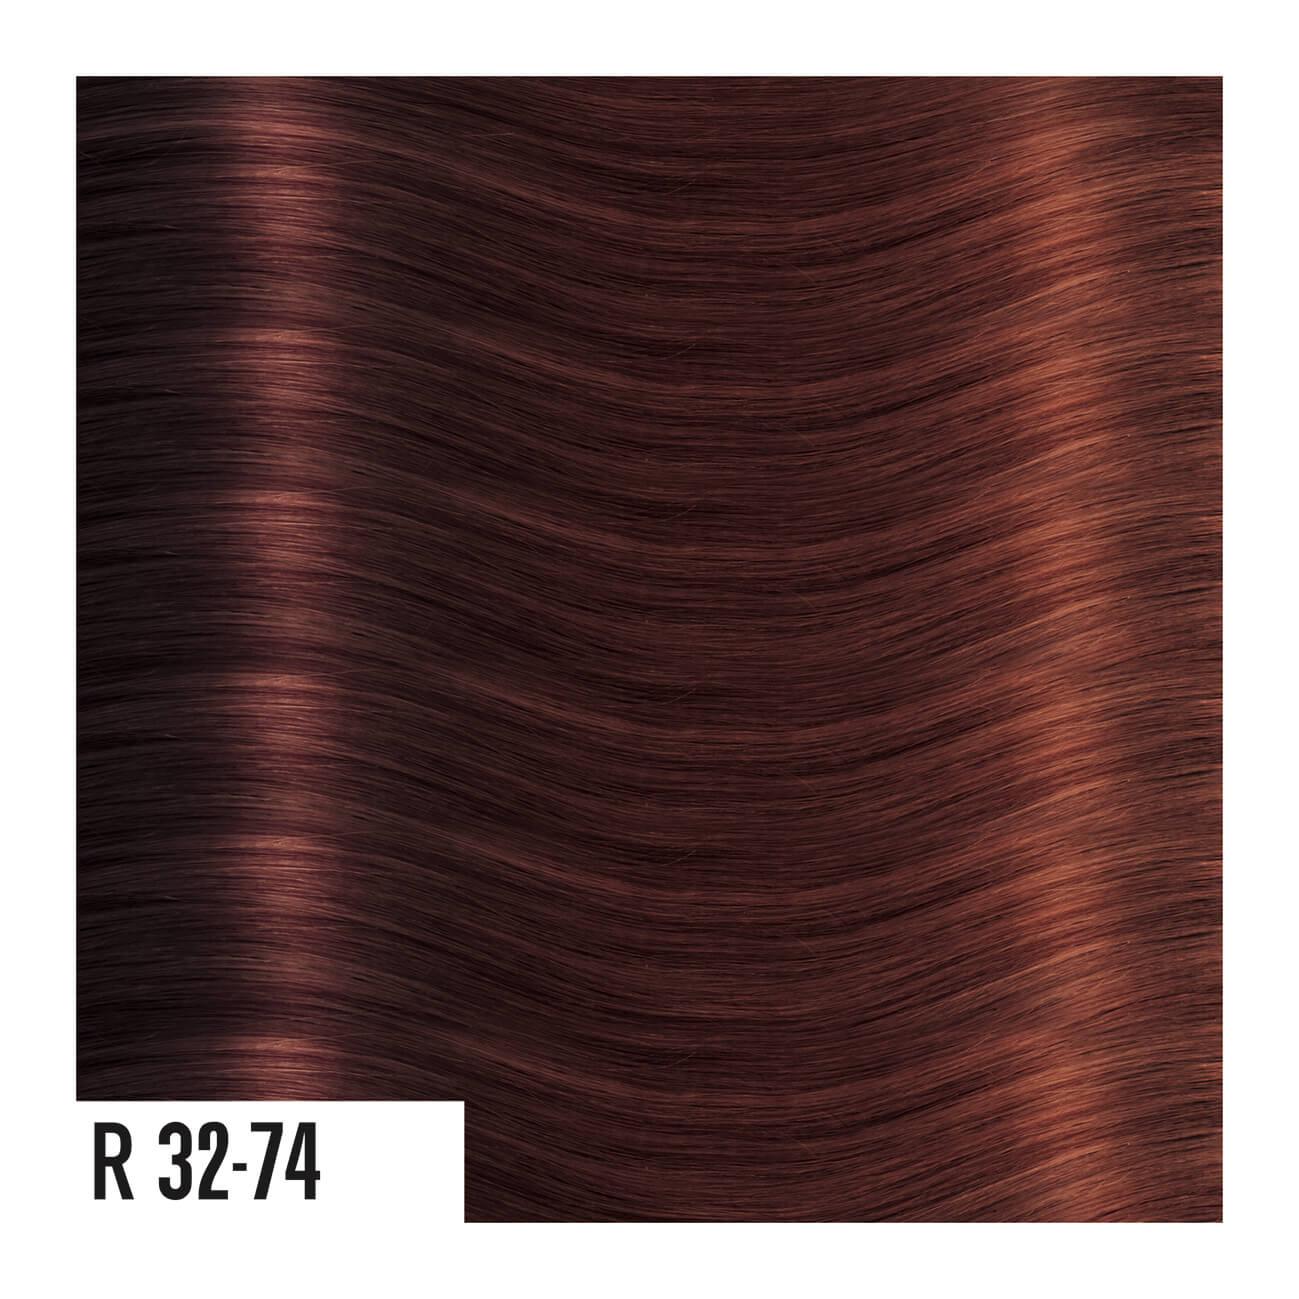 R32-74